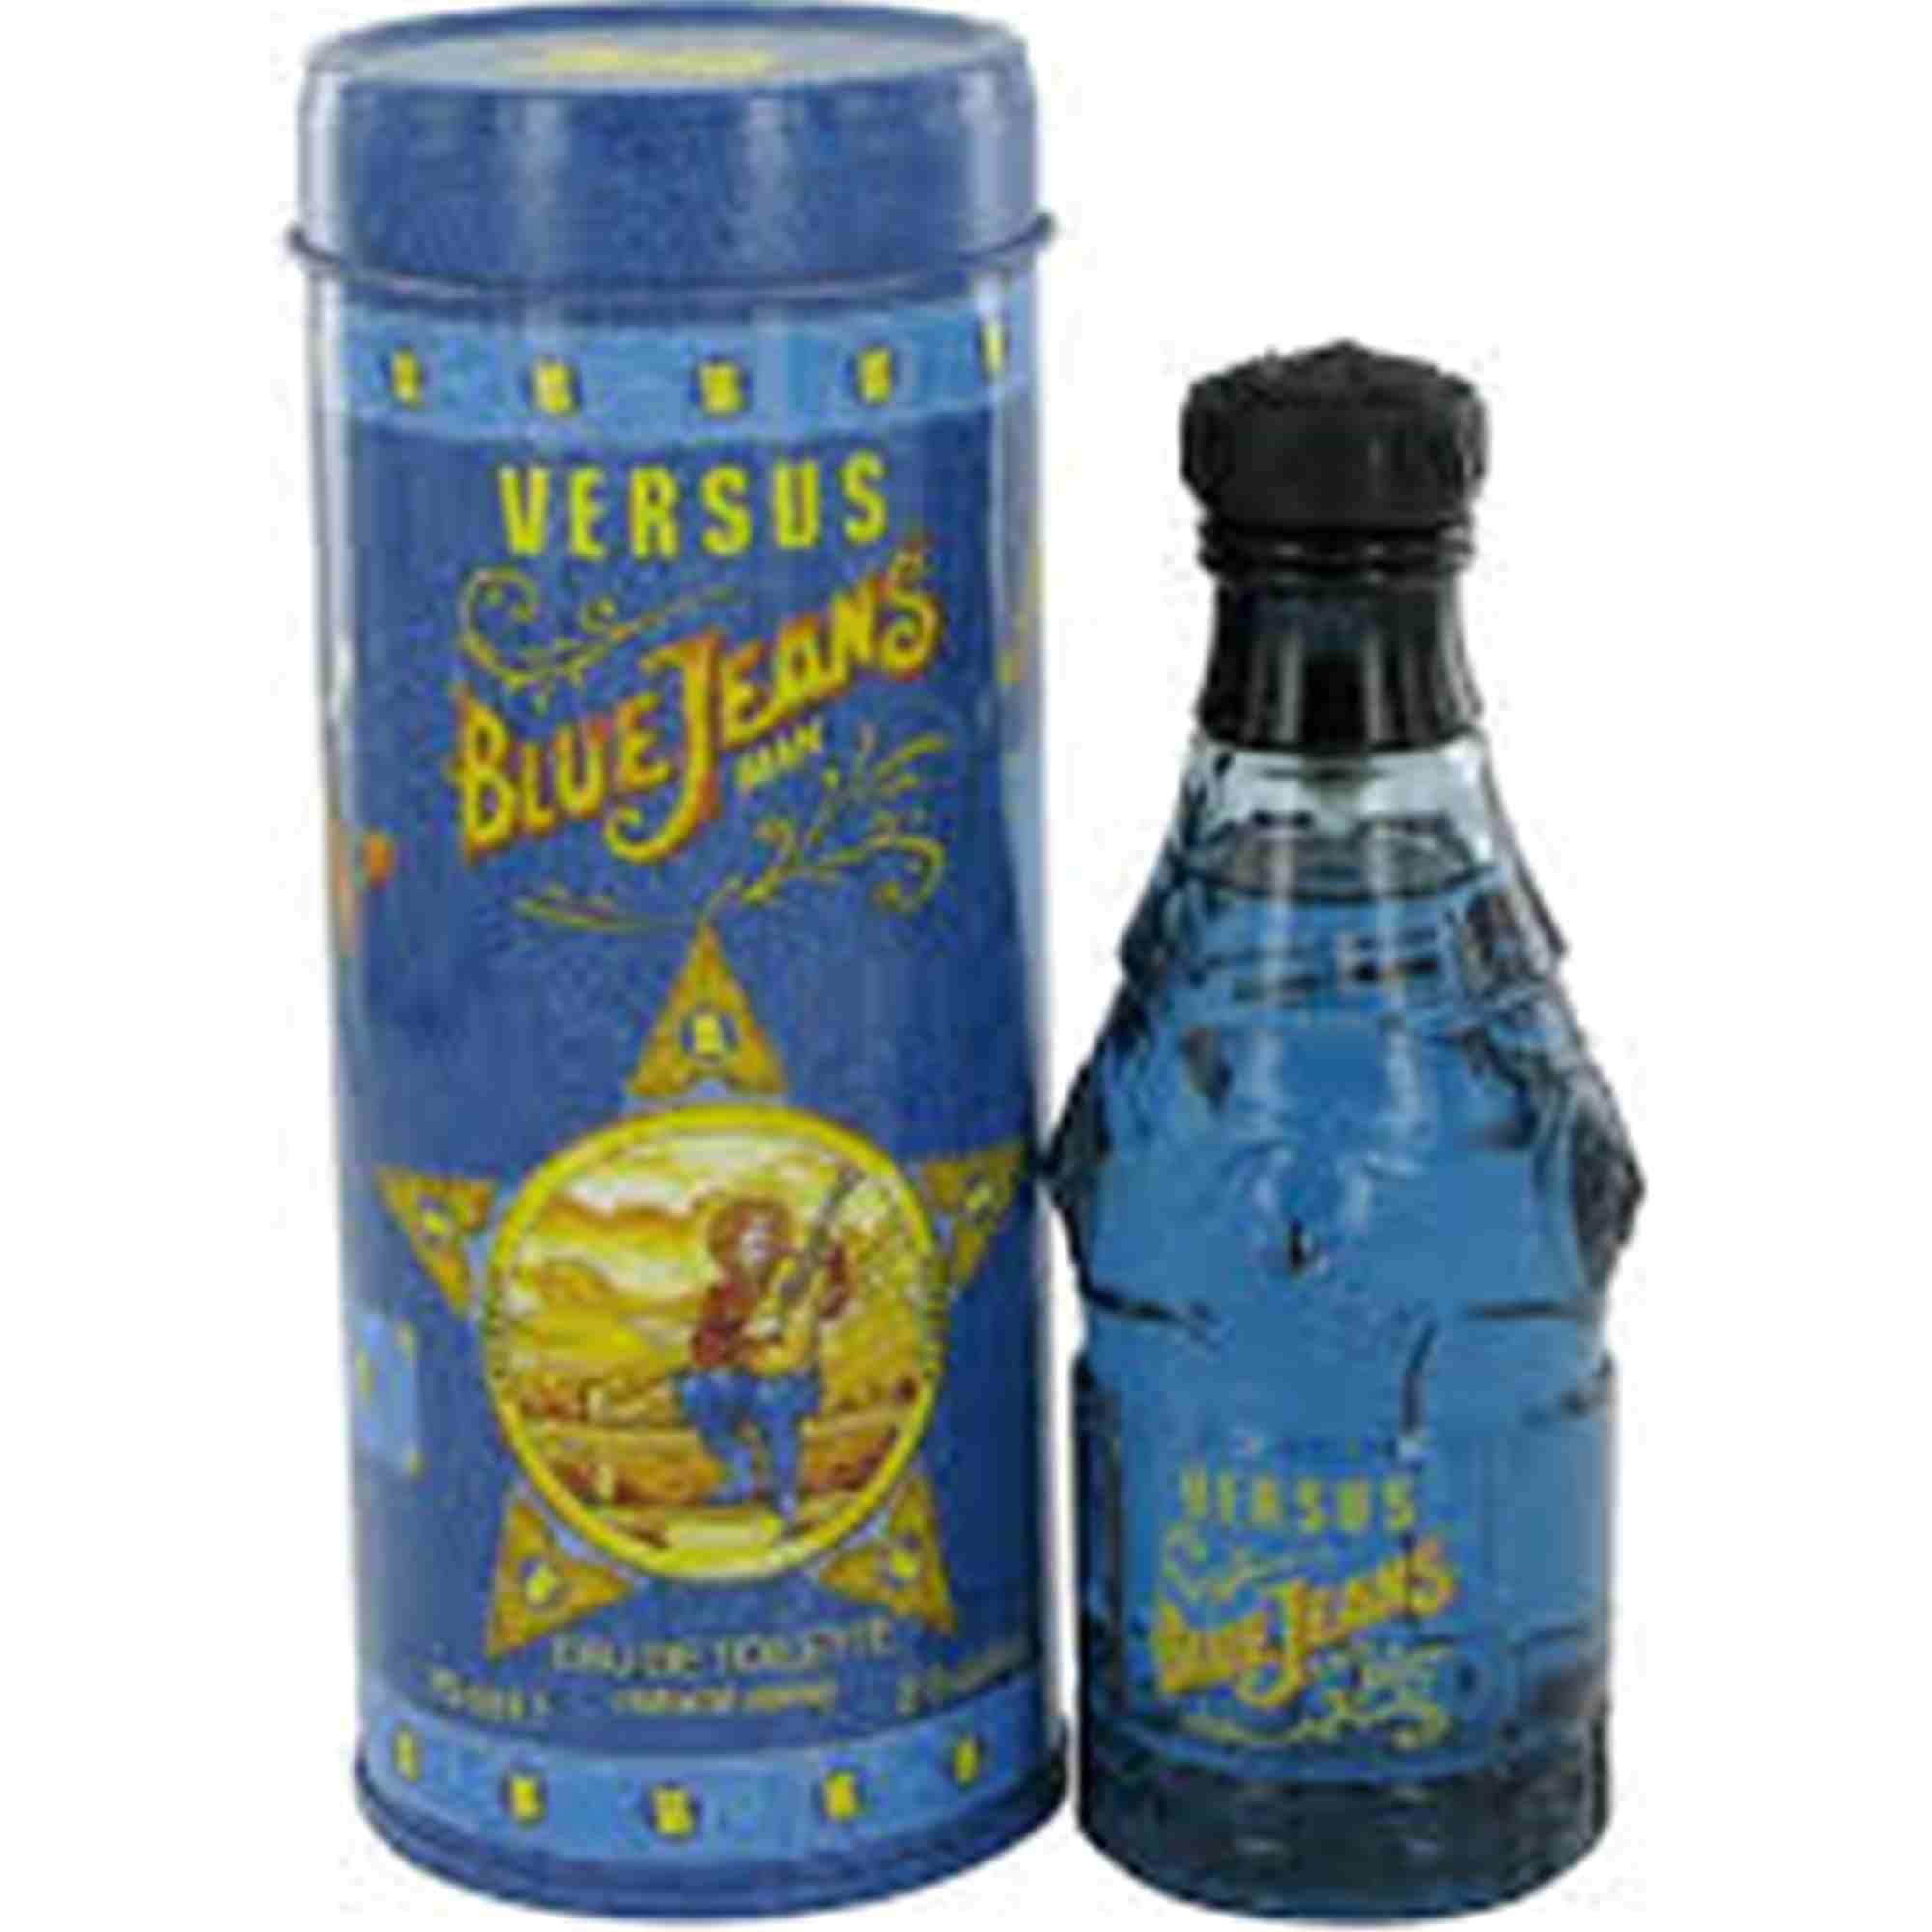 Versace Blue Jeans For Men Perfume 100 ml